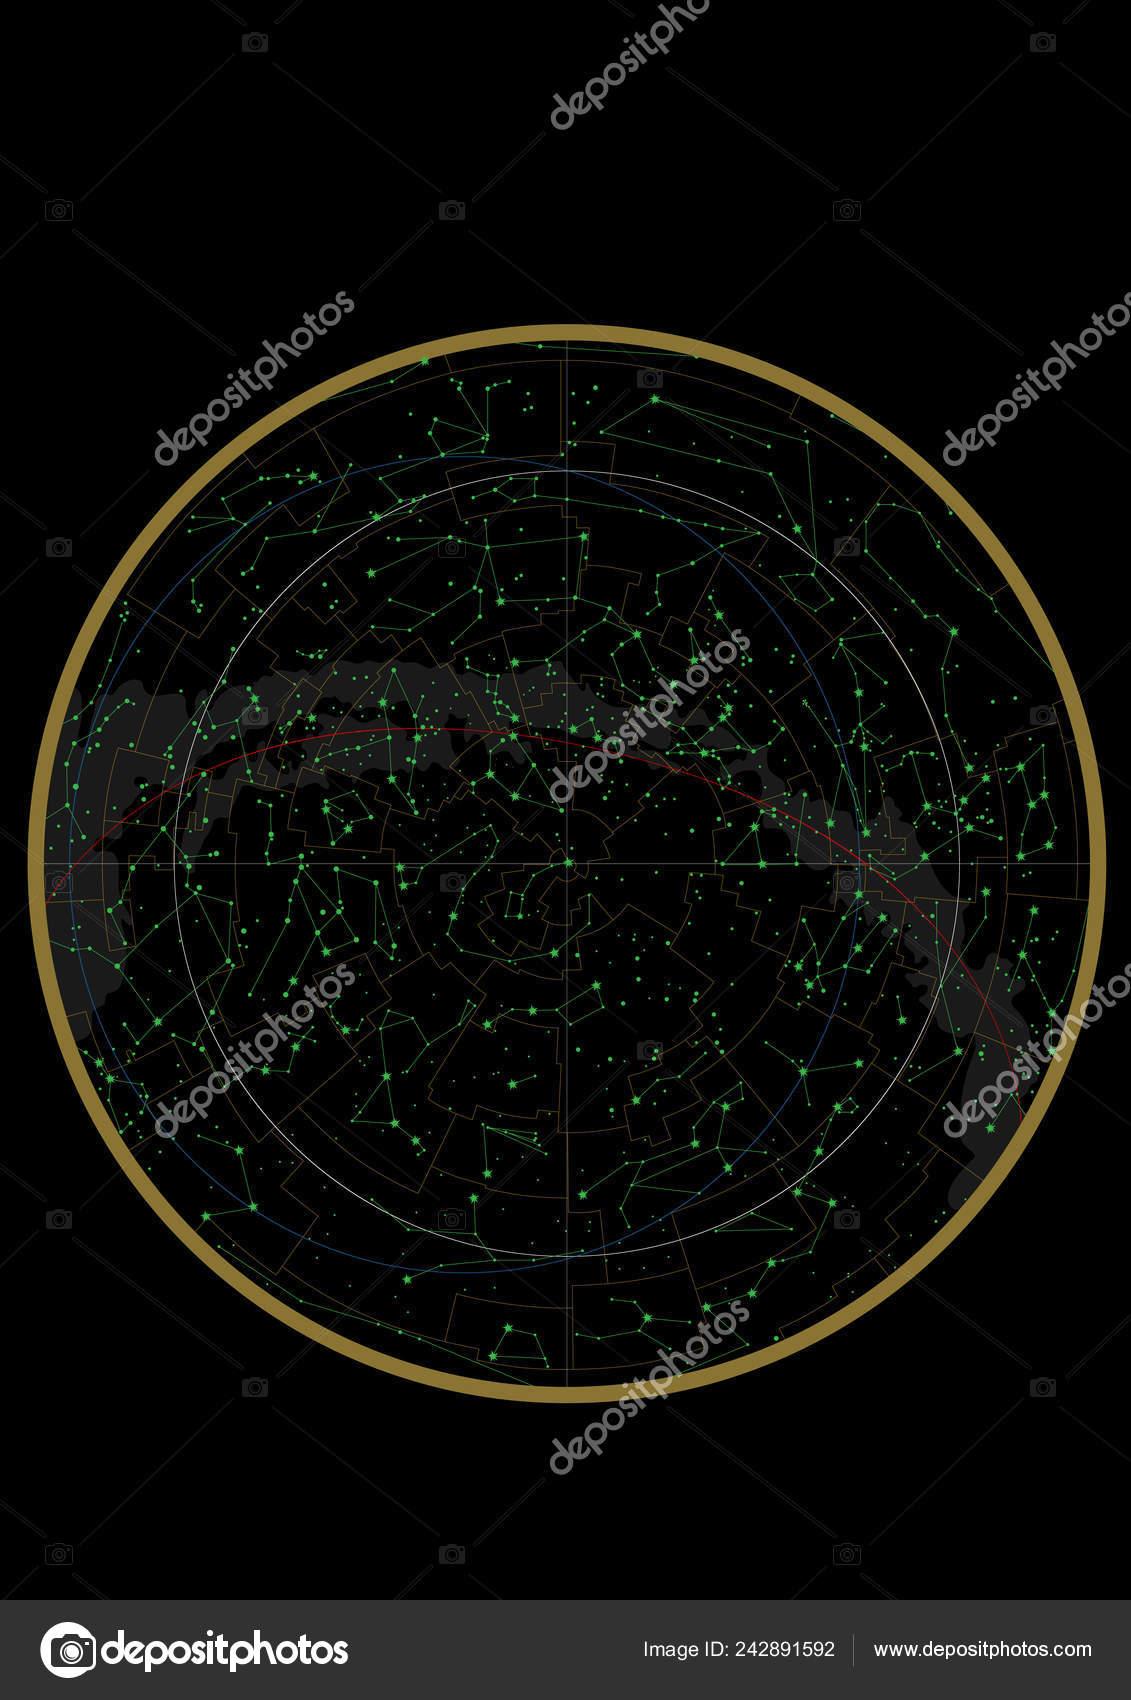 Northern Hemisphere Constellations Star Map Science Astronomy